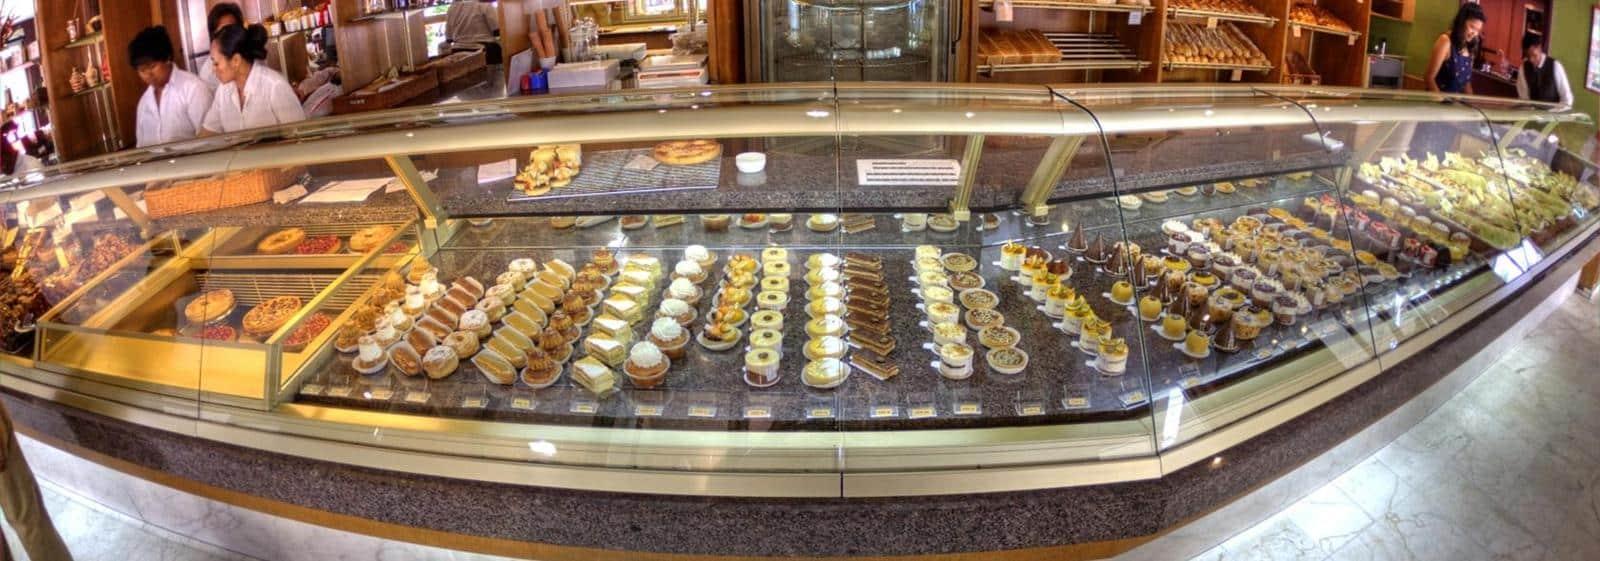 pâtisserie Cobert